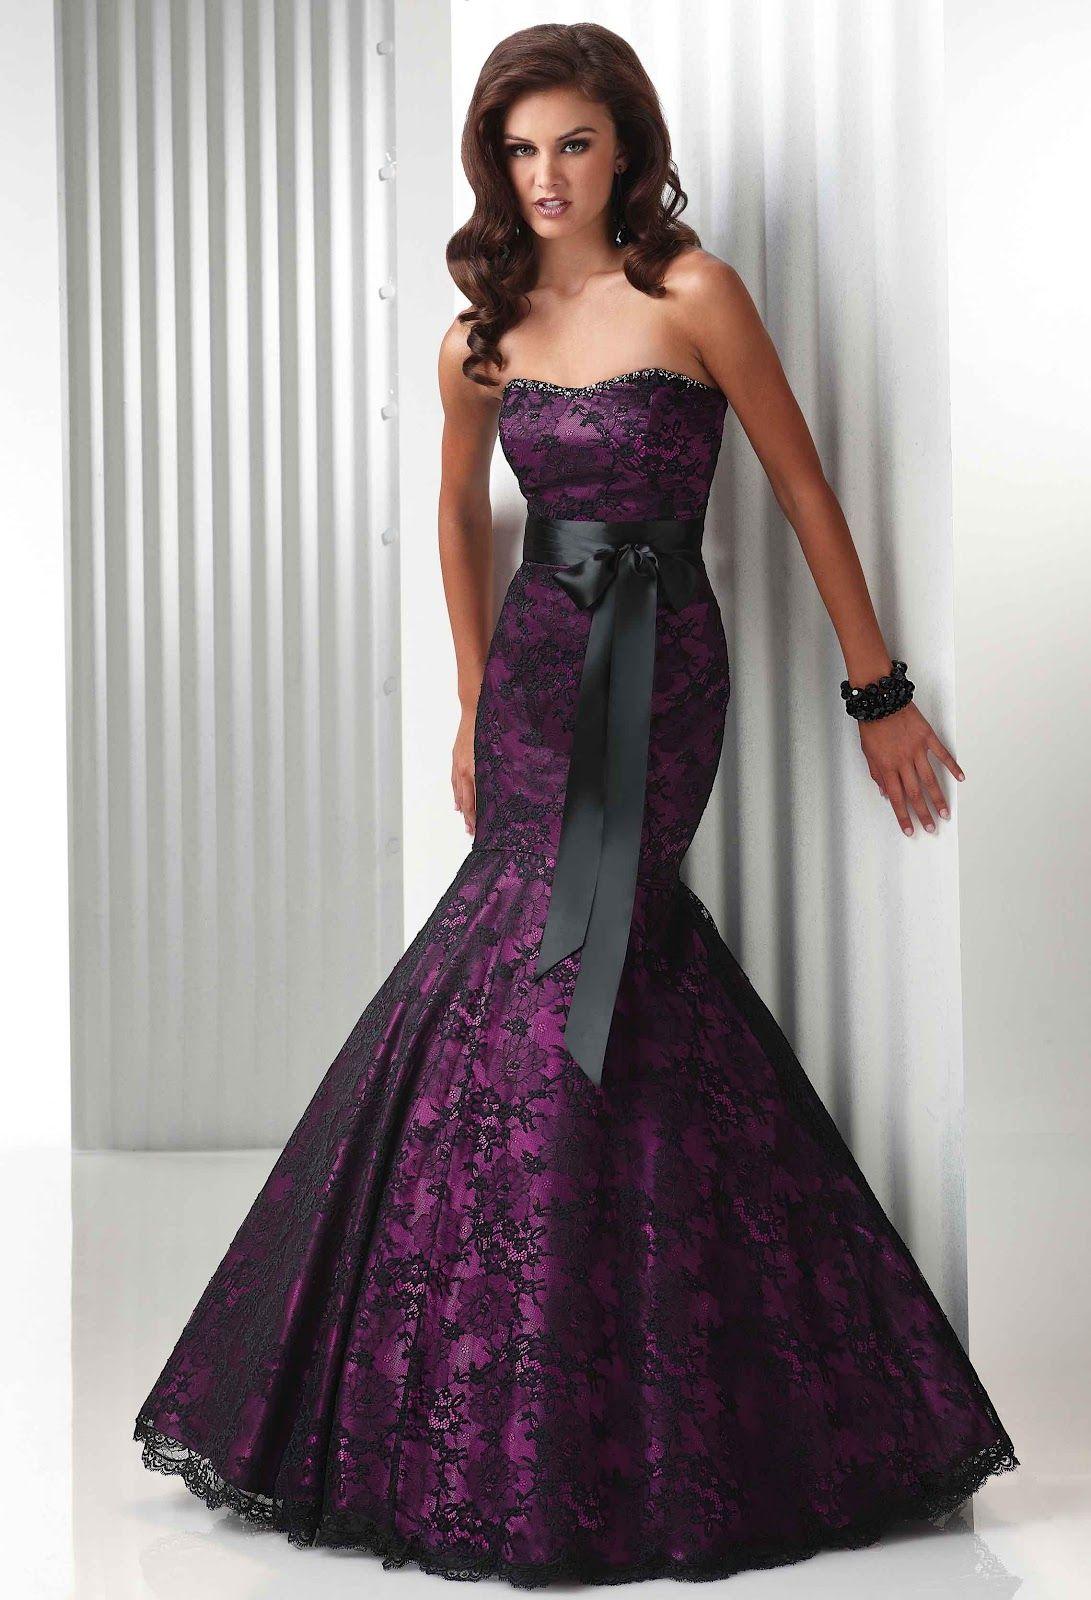 Attractive Mermaid Evening Dresses Purple Wedding Dresses Gowns Gothic Wedding Dress Black Lace Evening Dress [ 1600 x 1091 Pixel ]